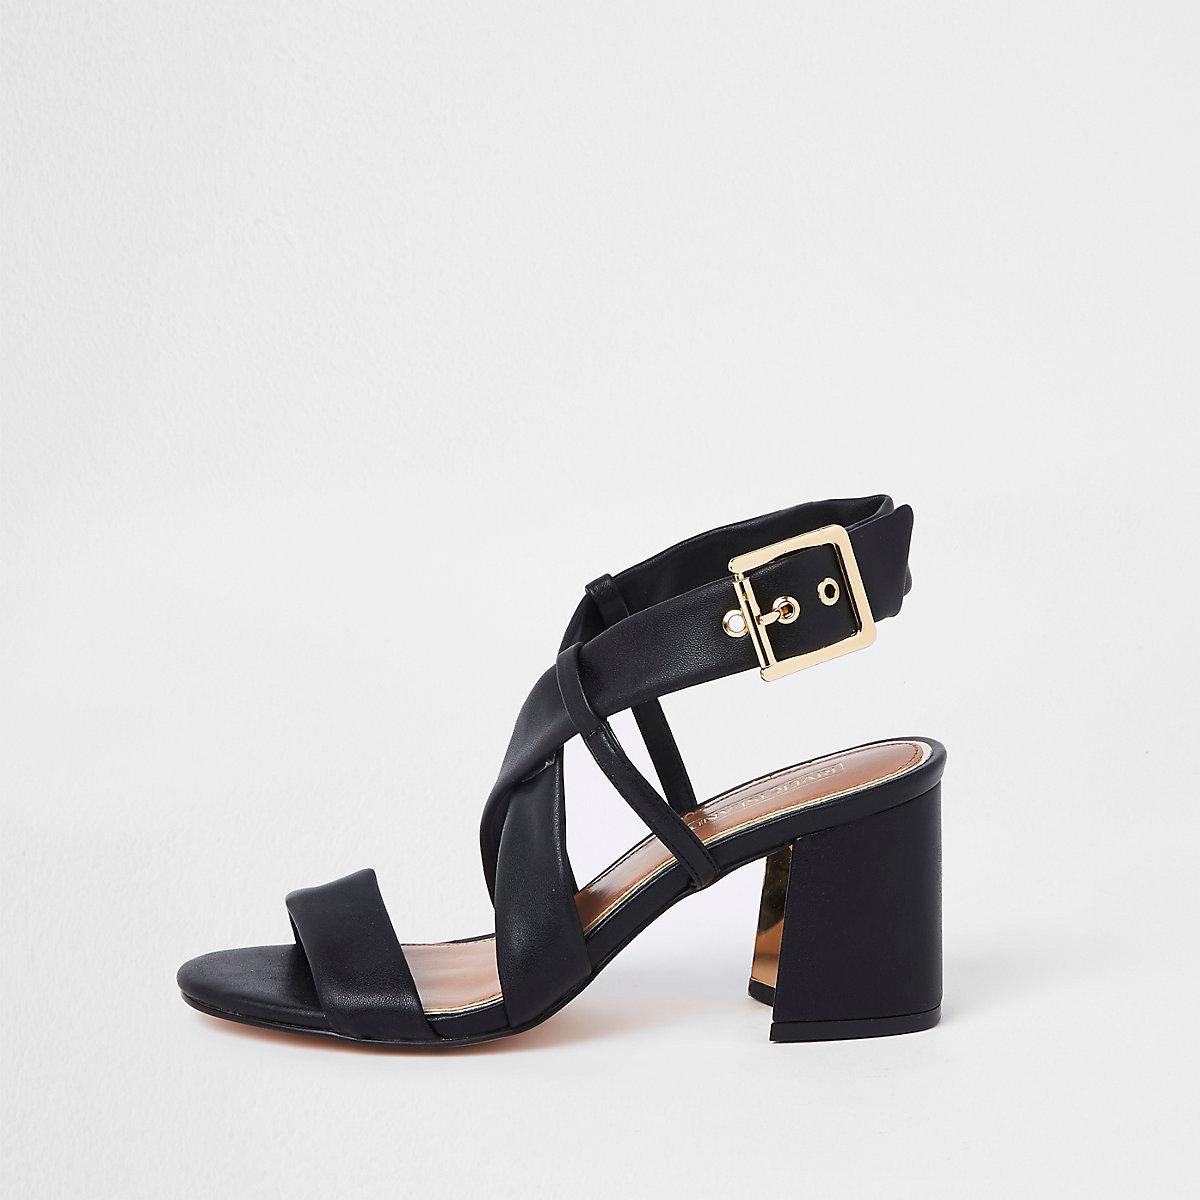 Zwarte sandalen met bandjes, brede pasvorm en blokhak